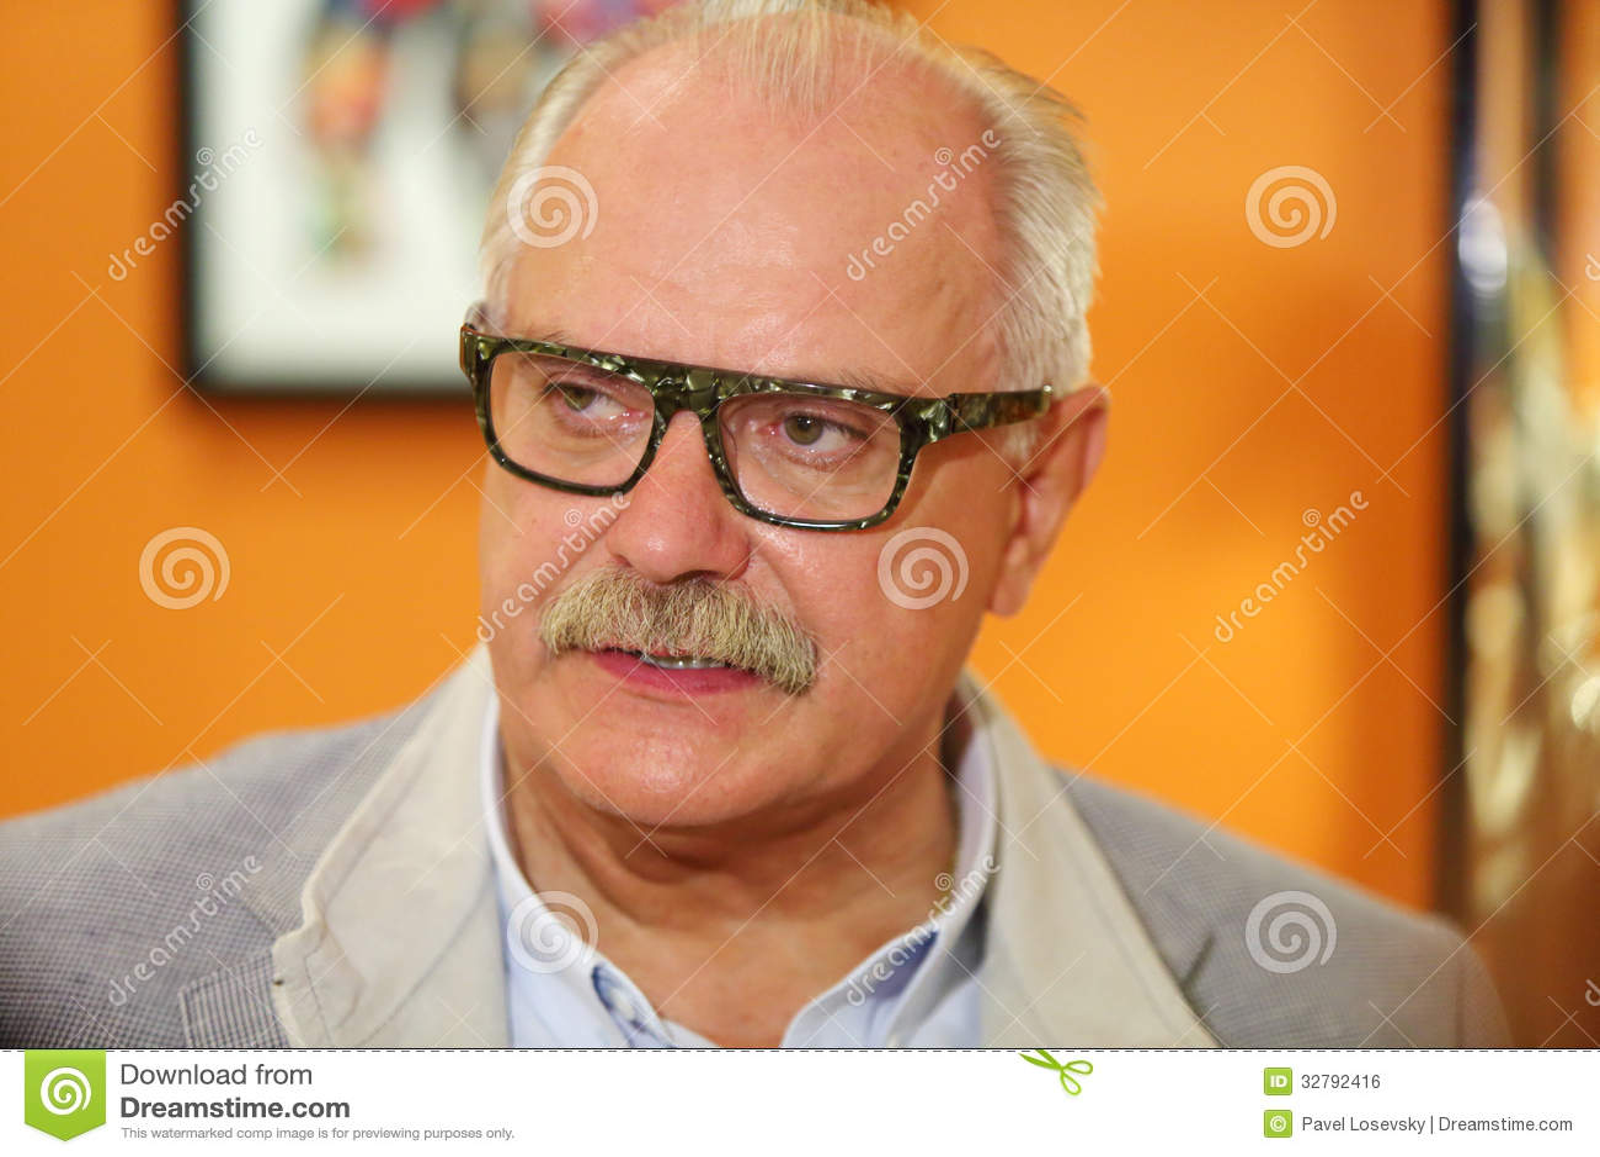 nikita mikhalkov 12 onlinenikita mikhalkov imdb, nikita mikhalkov wiki, nikita mikhalkov five evenings, nikita mikhalkov besogon tv, nikita mikhalkov filmography, nikita mikhalkov siberian barber, nikita mikhalkov oscar, nikita mikhalkov 12, nikita mikhalkov net worth, nikita mikhalkov burnt by the sun, nikita mikhalkov wikipedia, nikita mikhalkov besogon, nikita mikhalkov kinopoisk, nikita mikhalkov filmleri, nikita mikhalkov, nikita mikhalkov movies, nikita mikhalkov films, nikita mikhalkov filmovi, nikita mikhalkov youtube, nikita mikhalkov 12 online